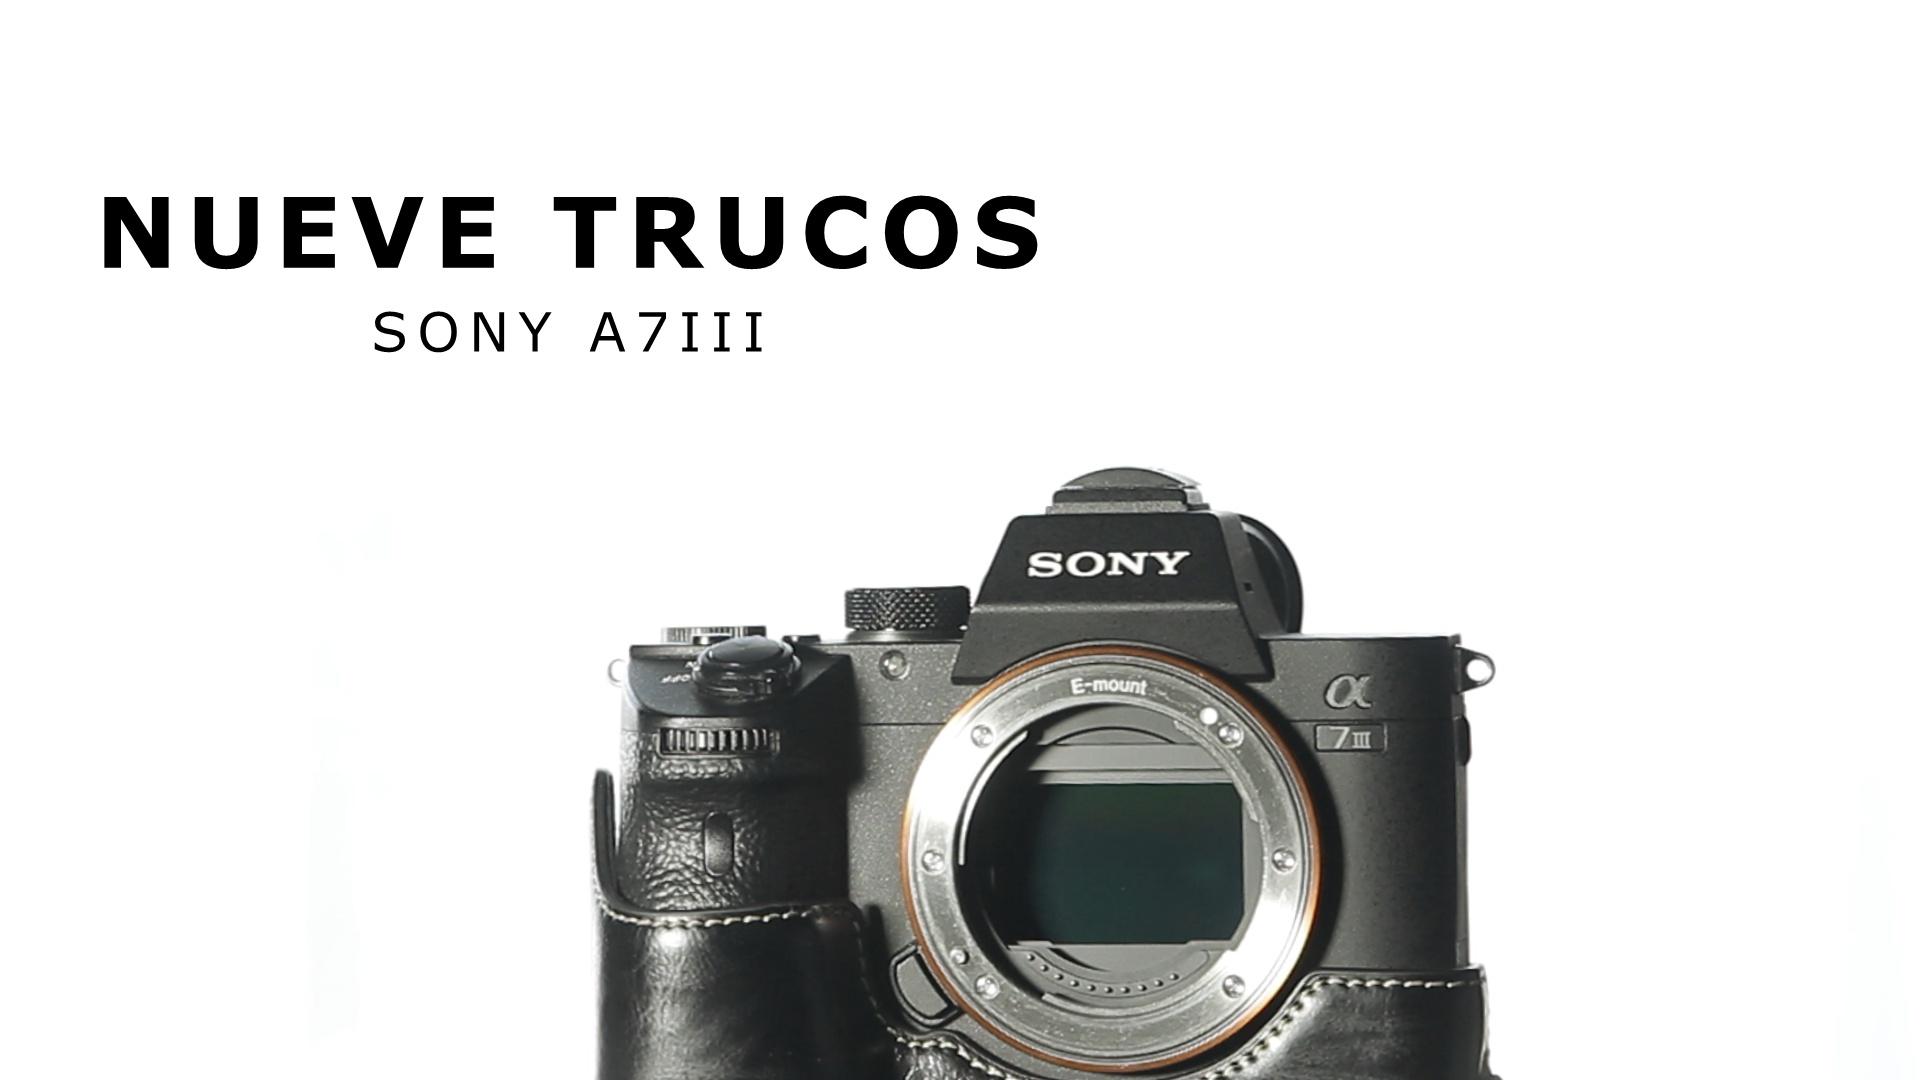 Nueve trucos Sony A7III